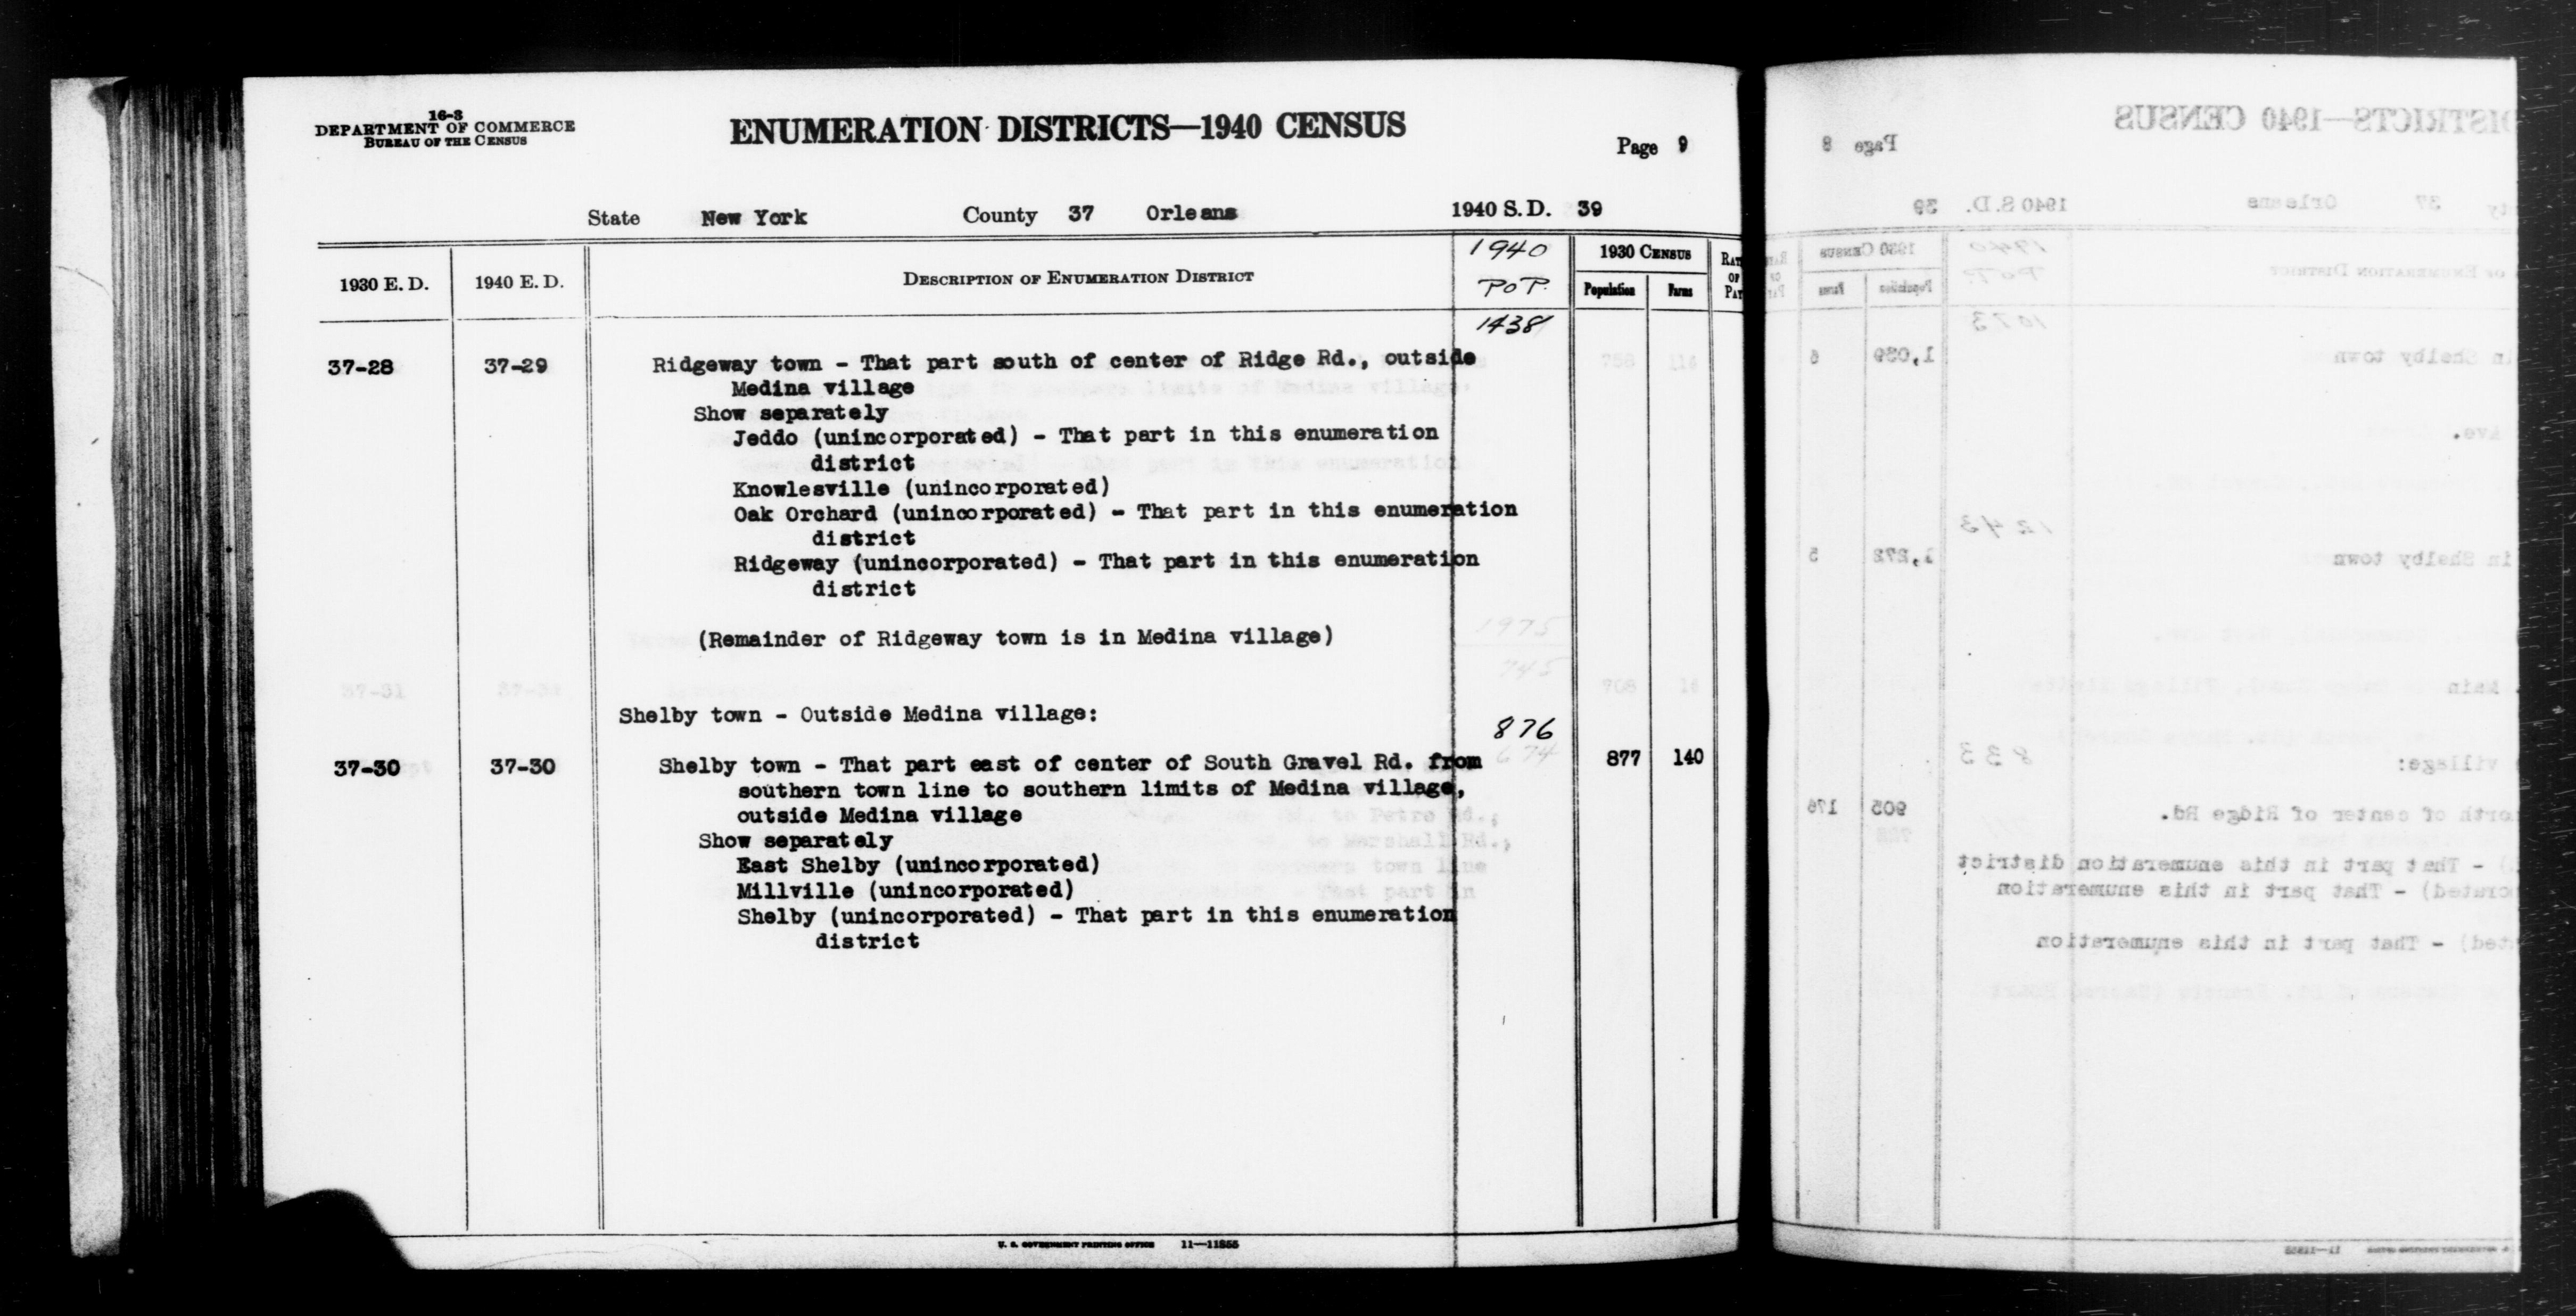 1940 Census Enumeration District Descriptions - New York - Orleans County - ED 37-29, ED 37-30